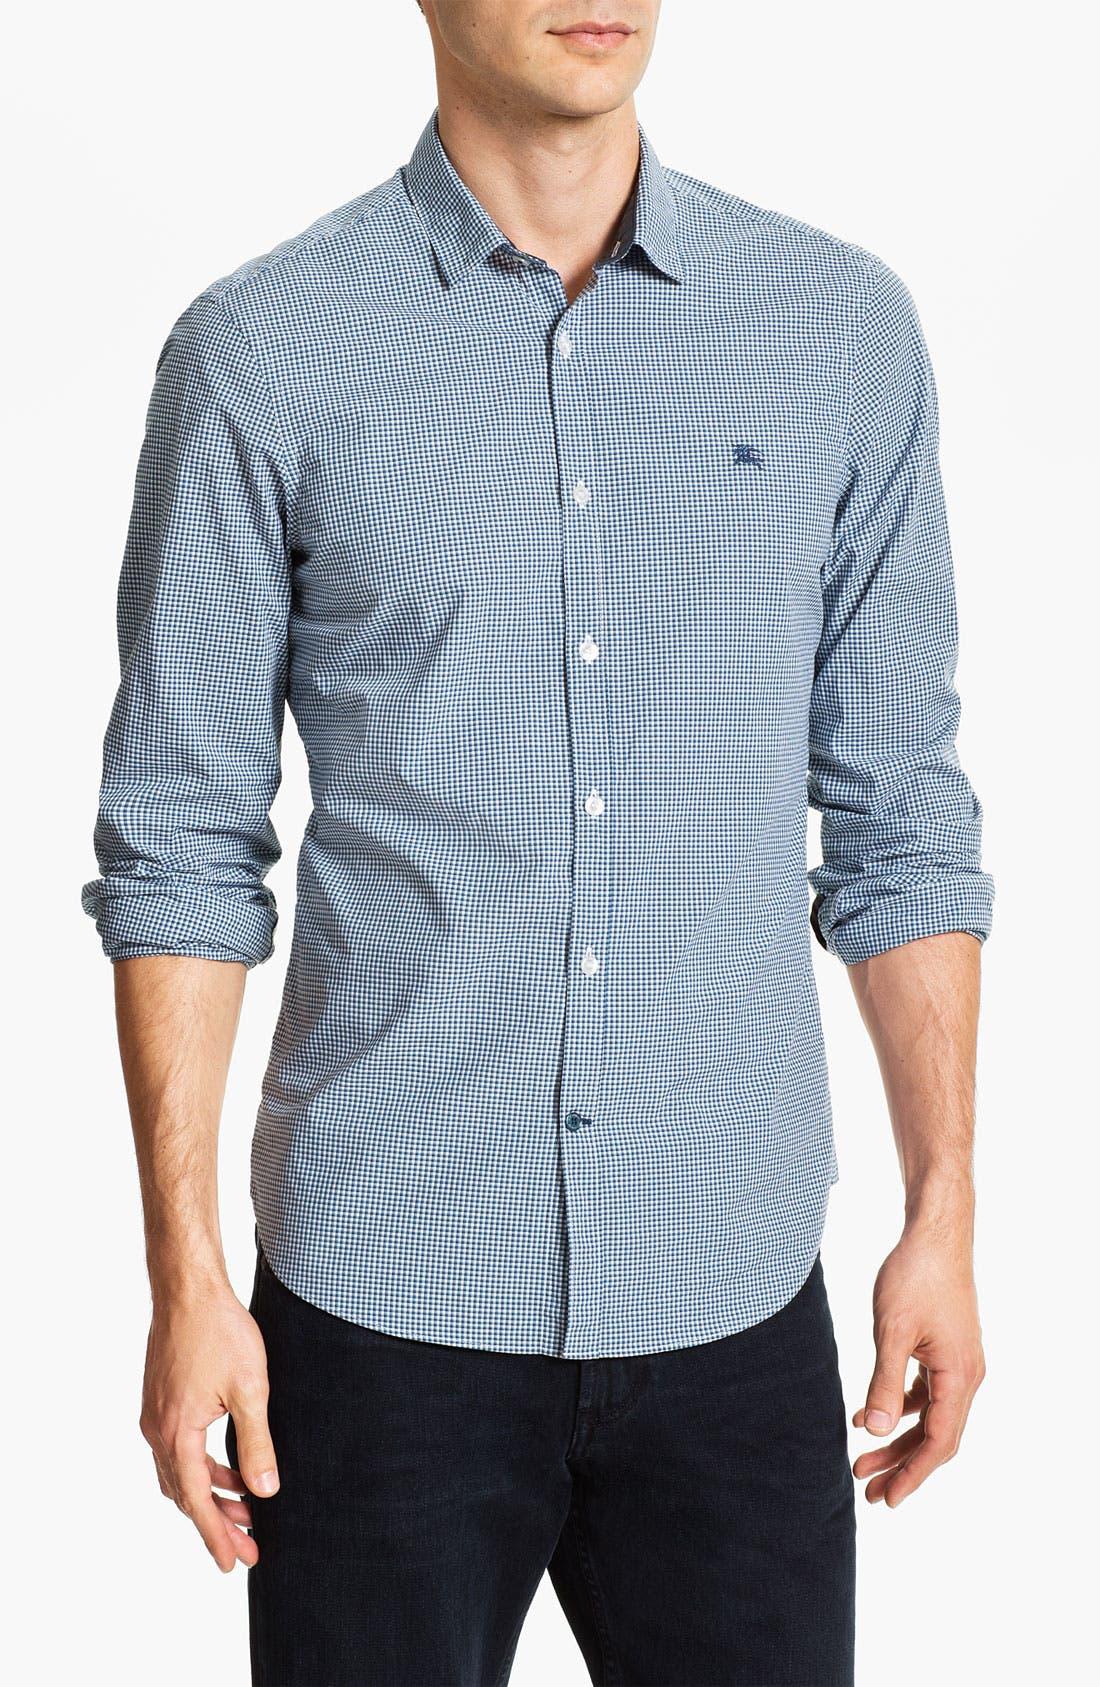 Alternate Image 1 Selected - Burberry Trim Fit Sport Shirt